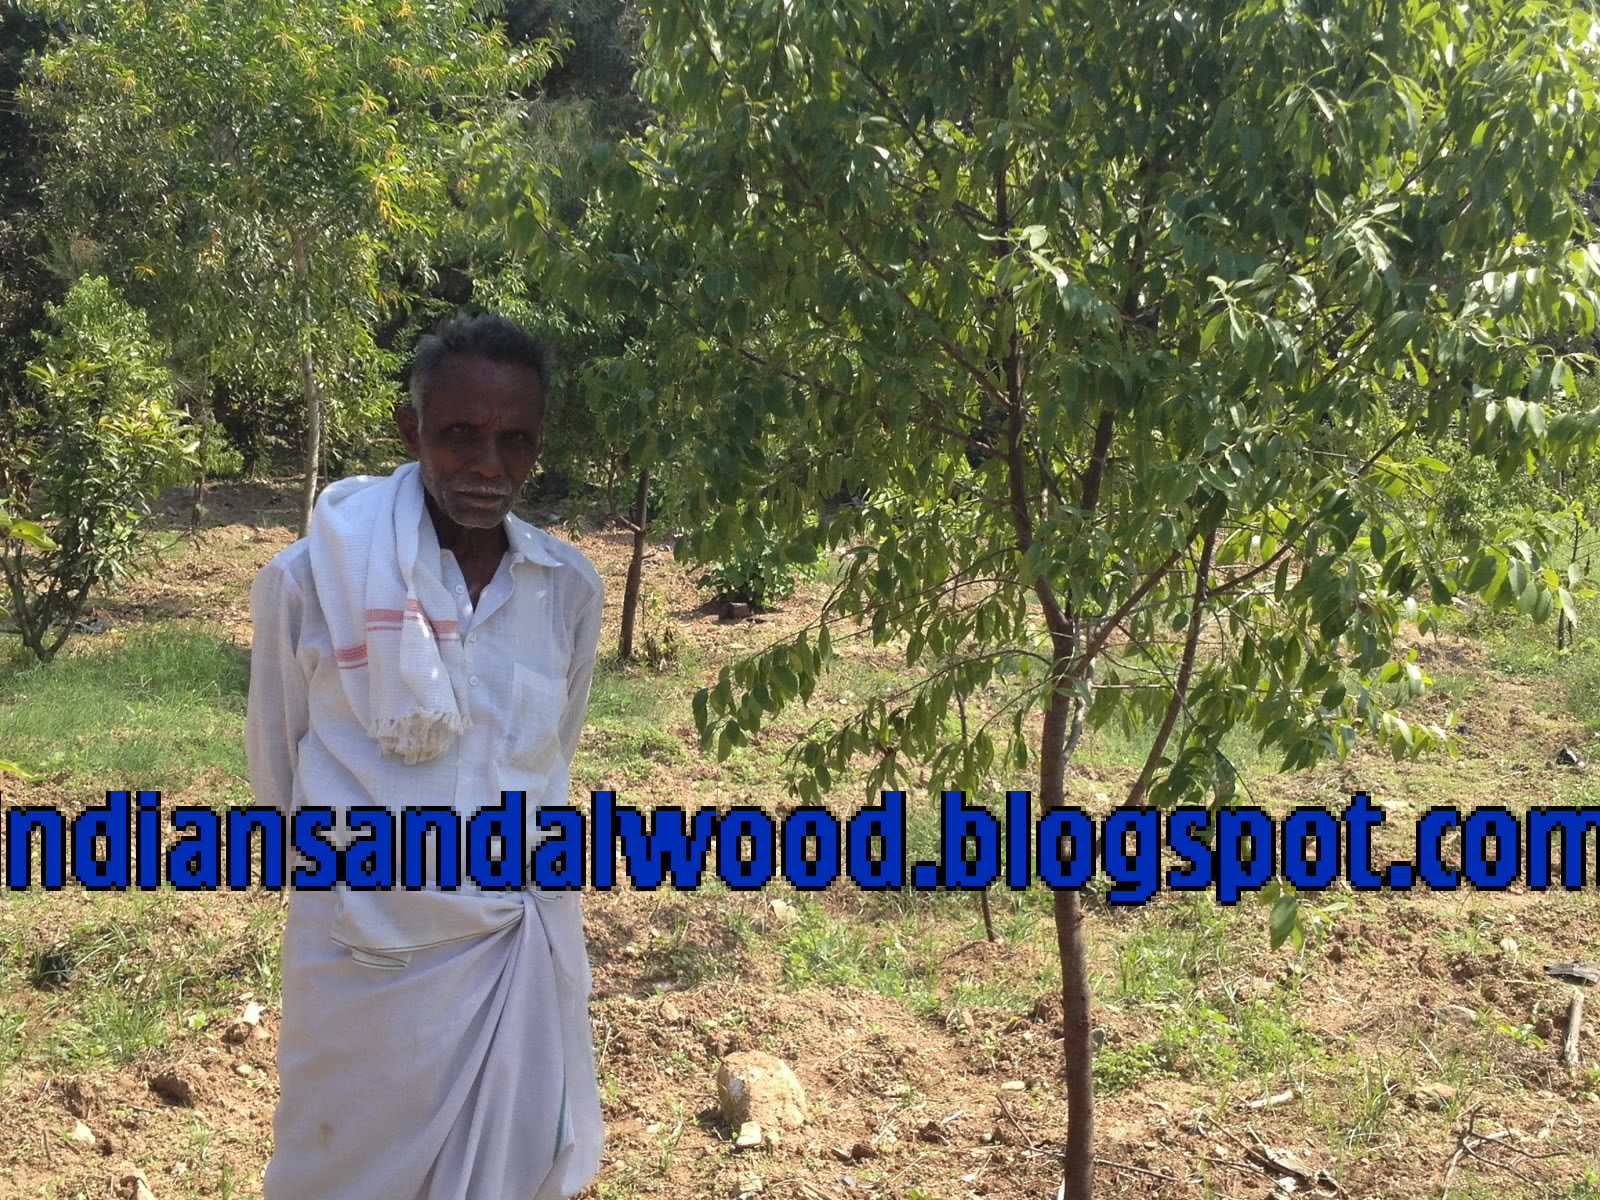 20kg Per Tree 9000 Kgs Qty Of Sapwood 30kg 13500 Average Cost